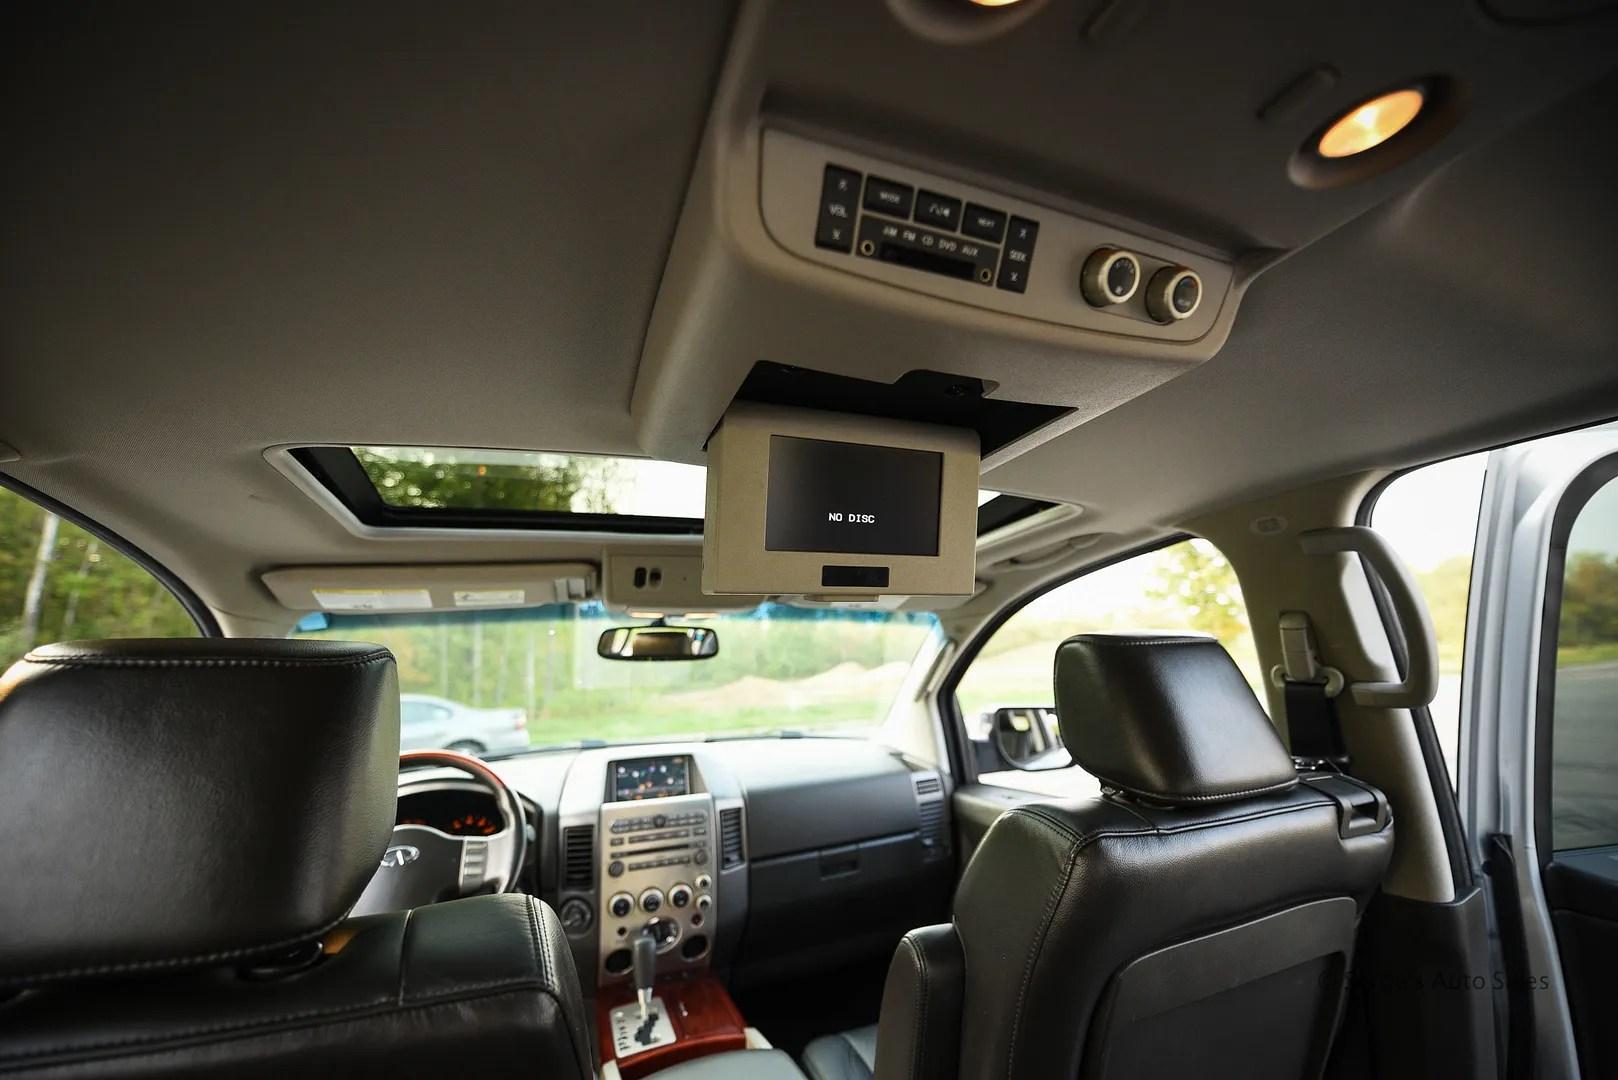 photo Infiniti-Serges-Auto-Sales-Car-dealer-Pennsylvania-QX56-Scranton-Nepa-58_zpsufgtpvlj.jpg